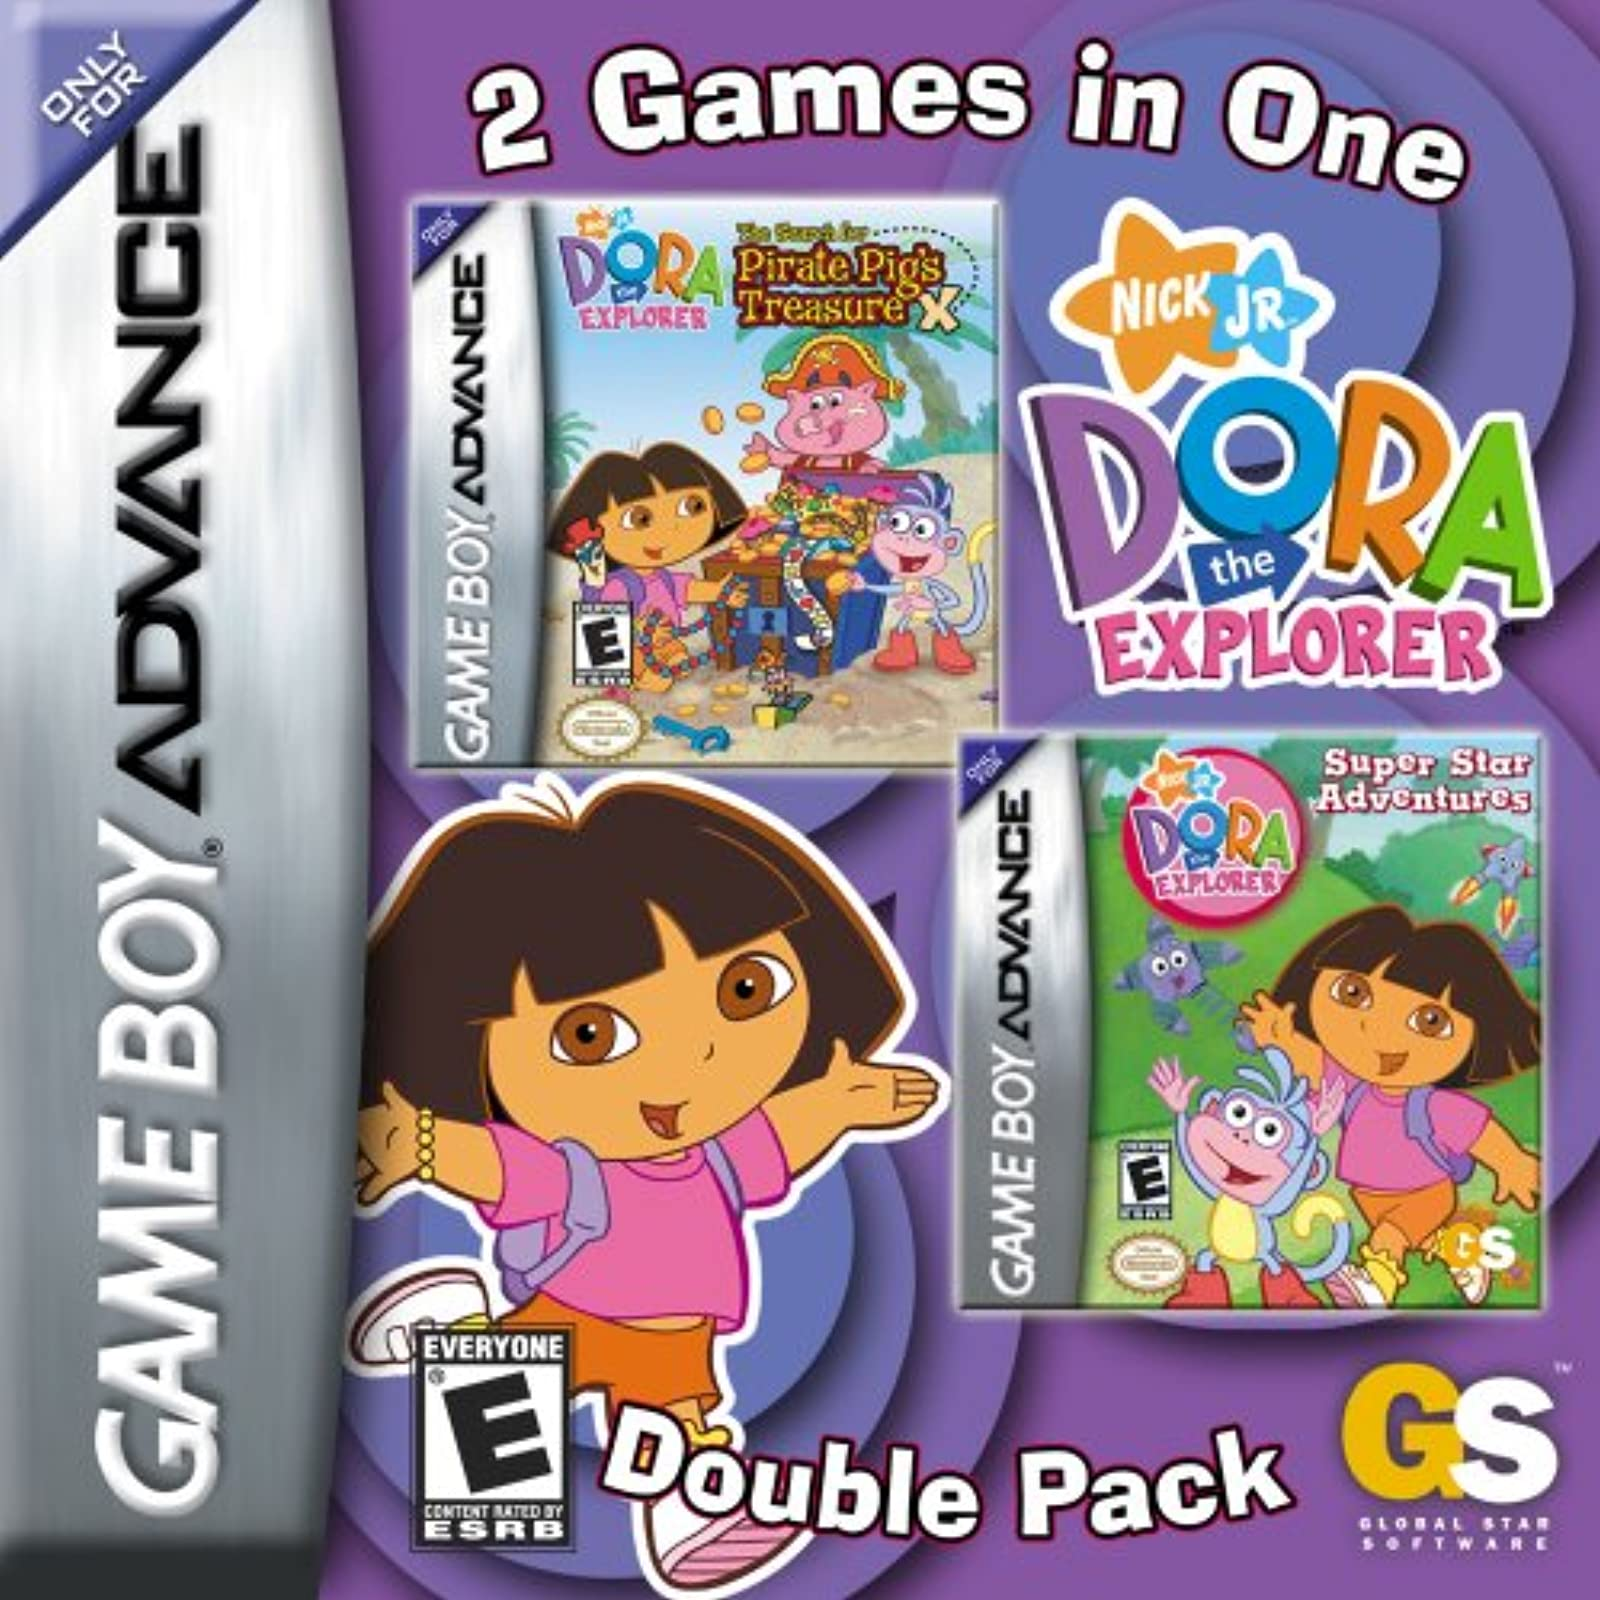 Dora The Explorer Super Star Adventures & The Search For Pirate Pig's Treasure D